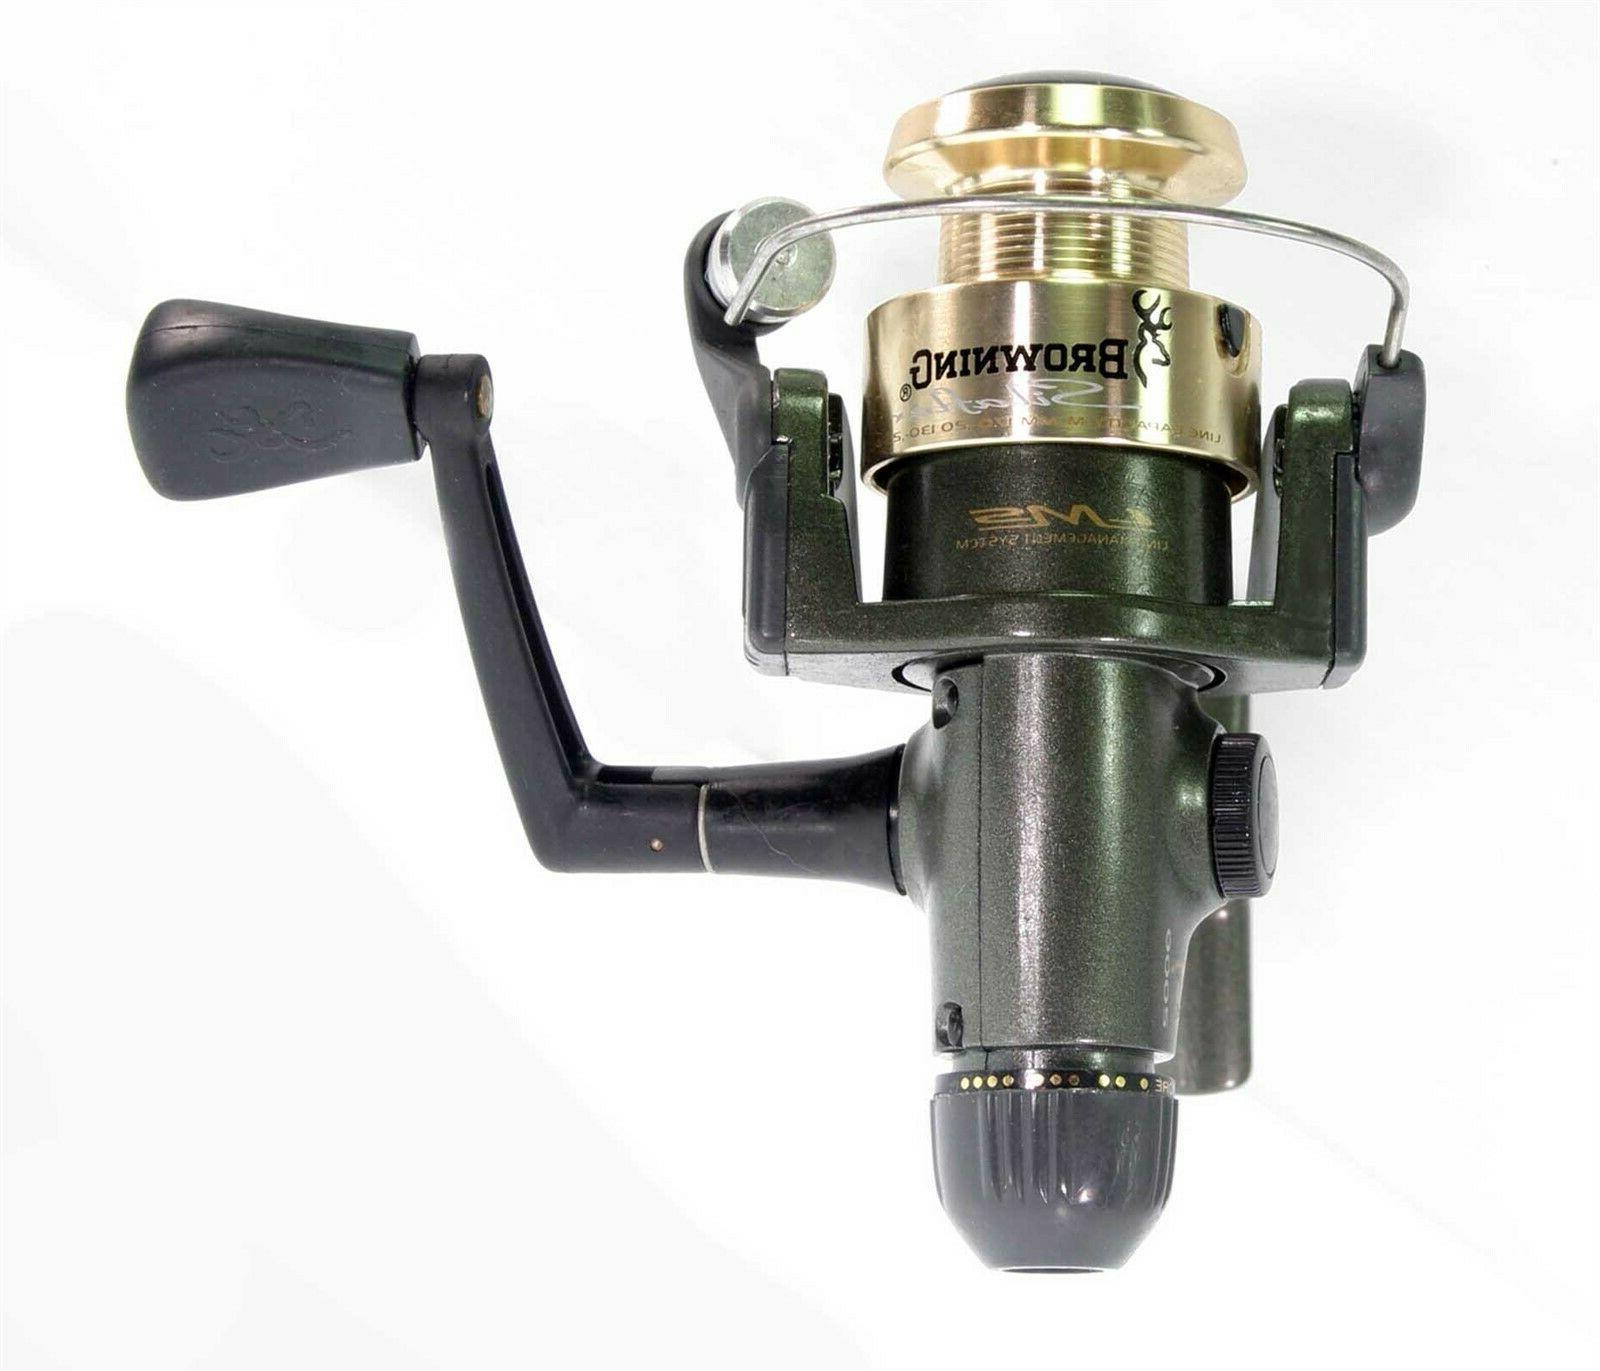 silaflex 2000 spinning fishing reel brand new